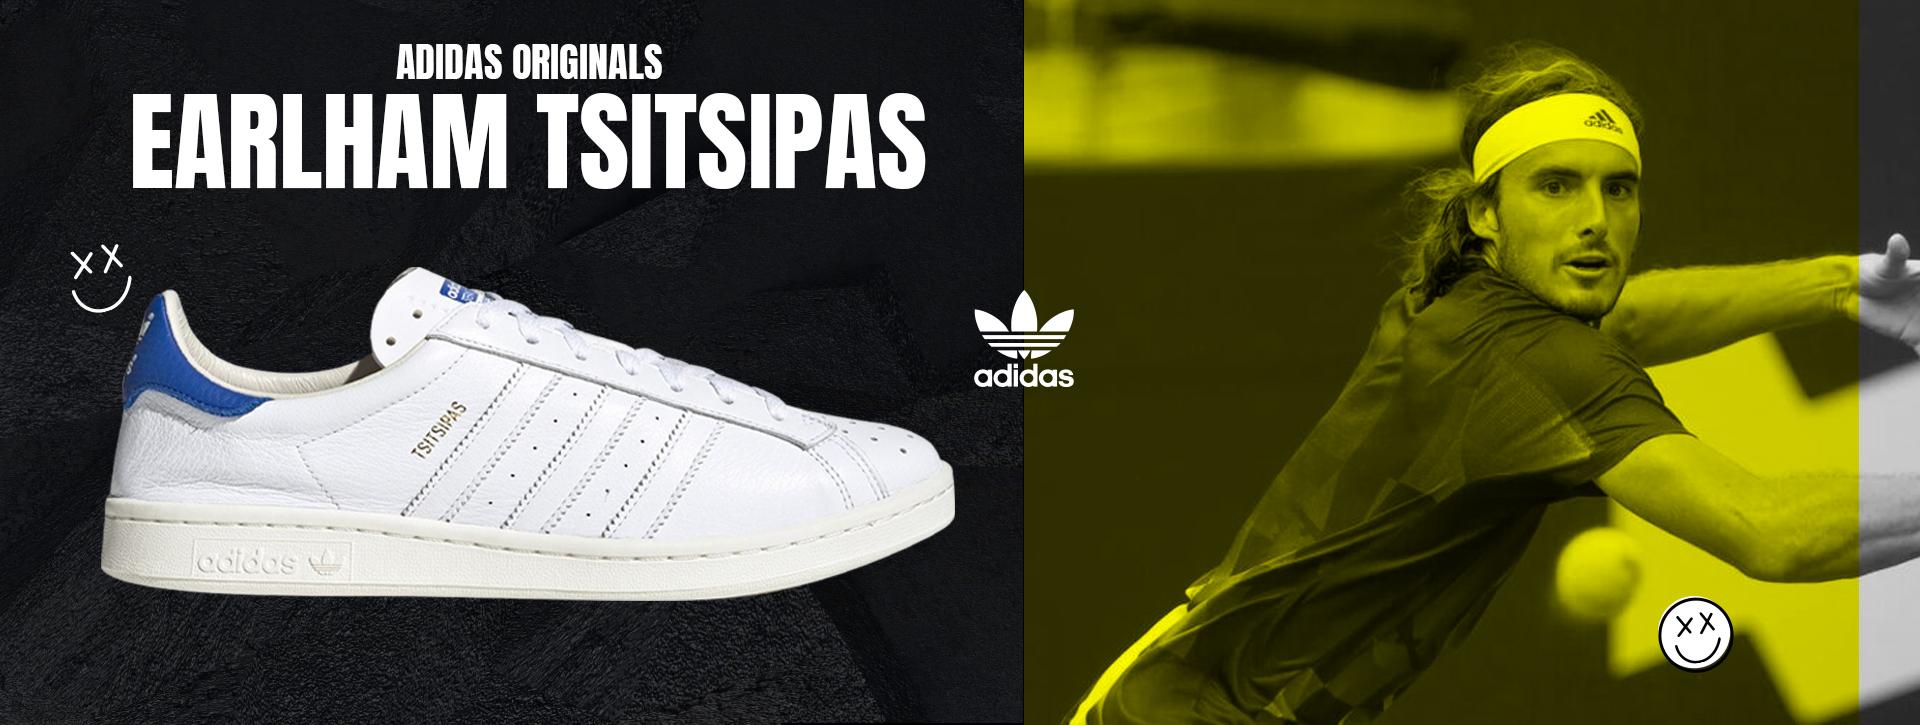 adidas Originals Earlham Tsitsipas